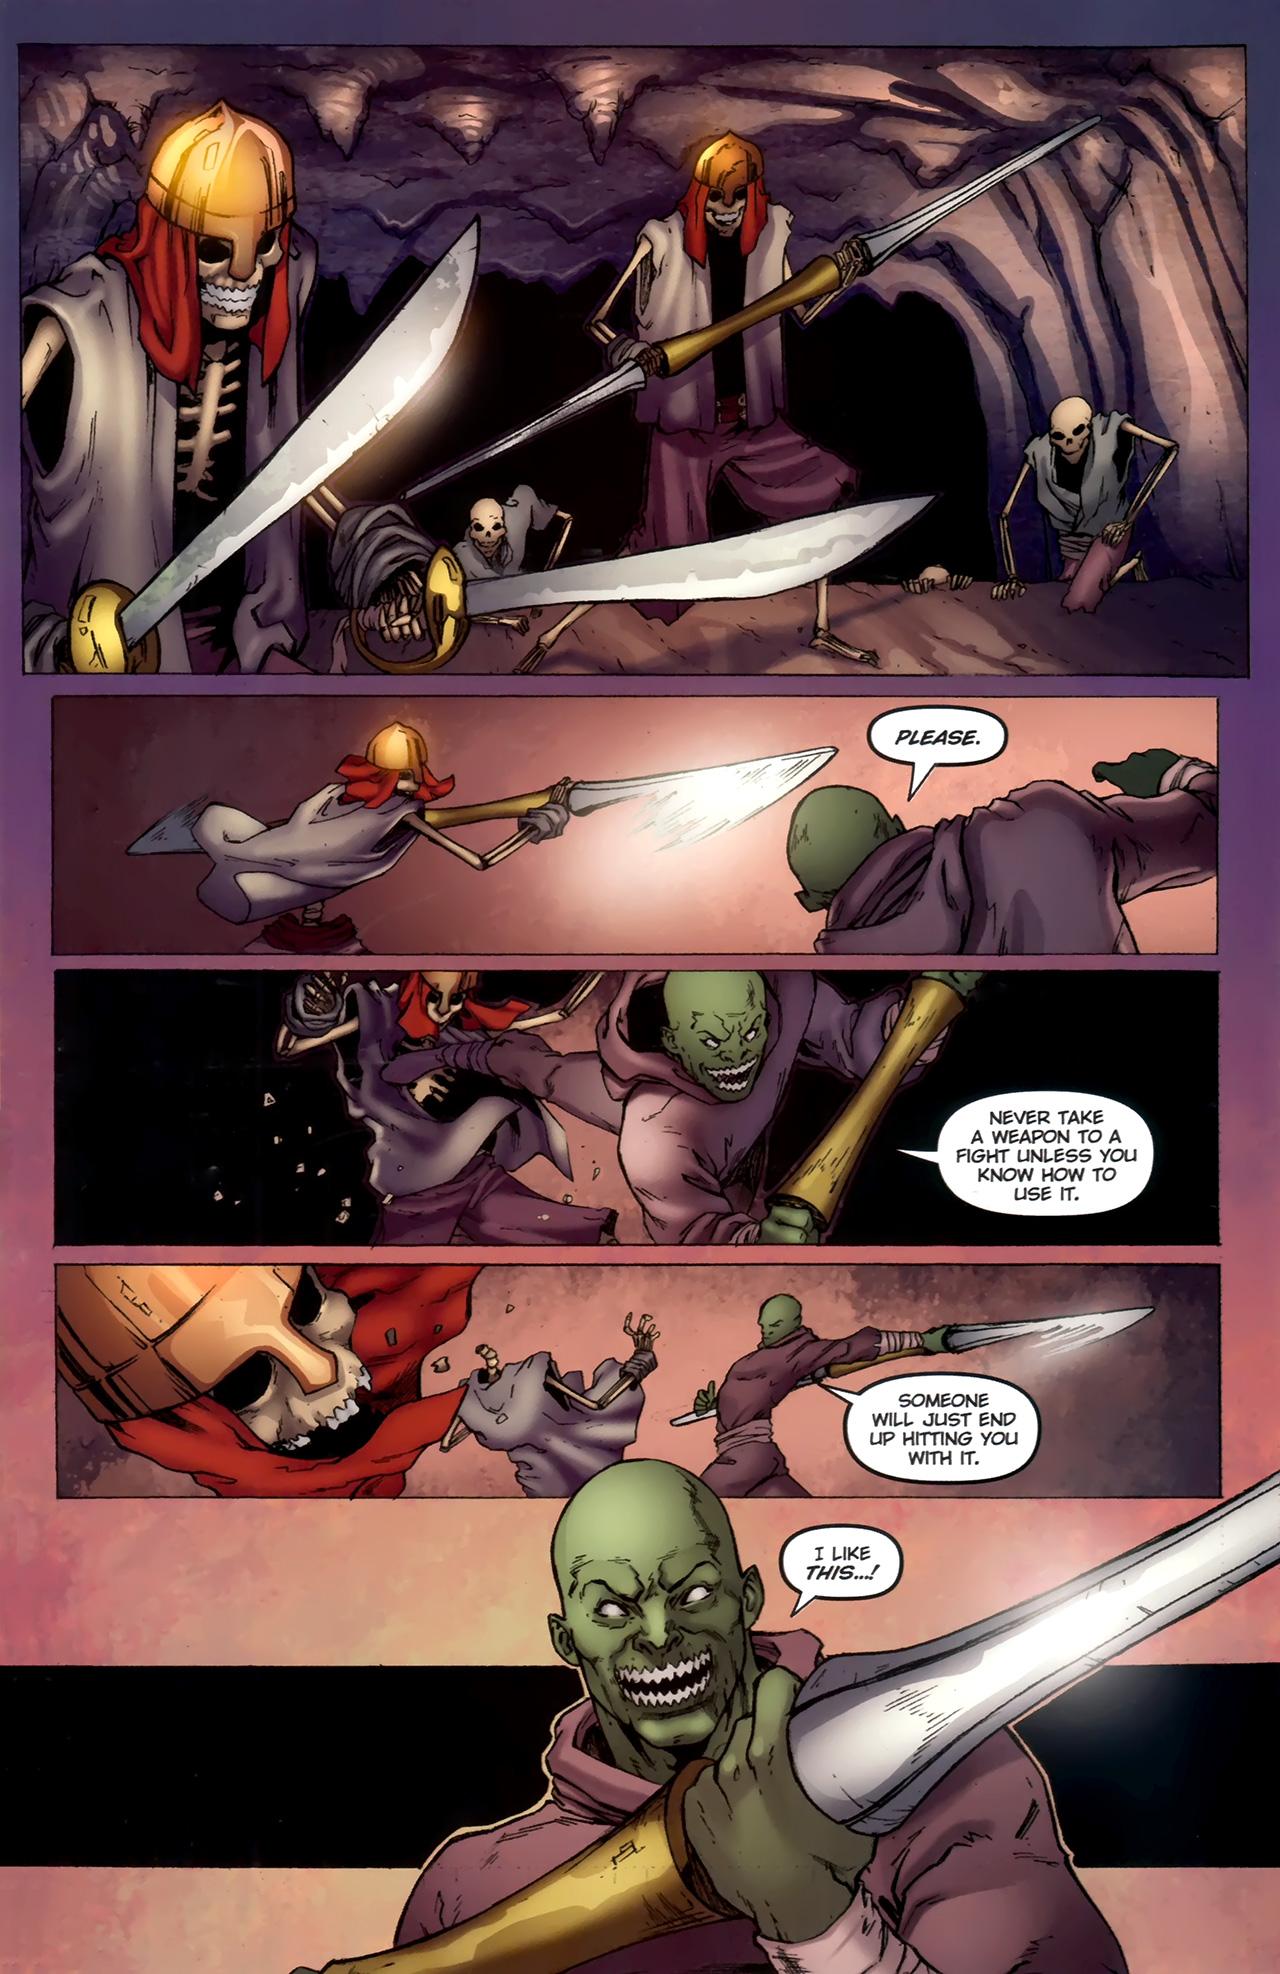 Read online 1001 Arabian Nights: The Adventures of Sinbad comic -  Issue #11 - 12